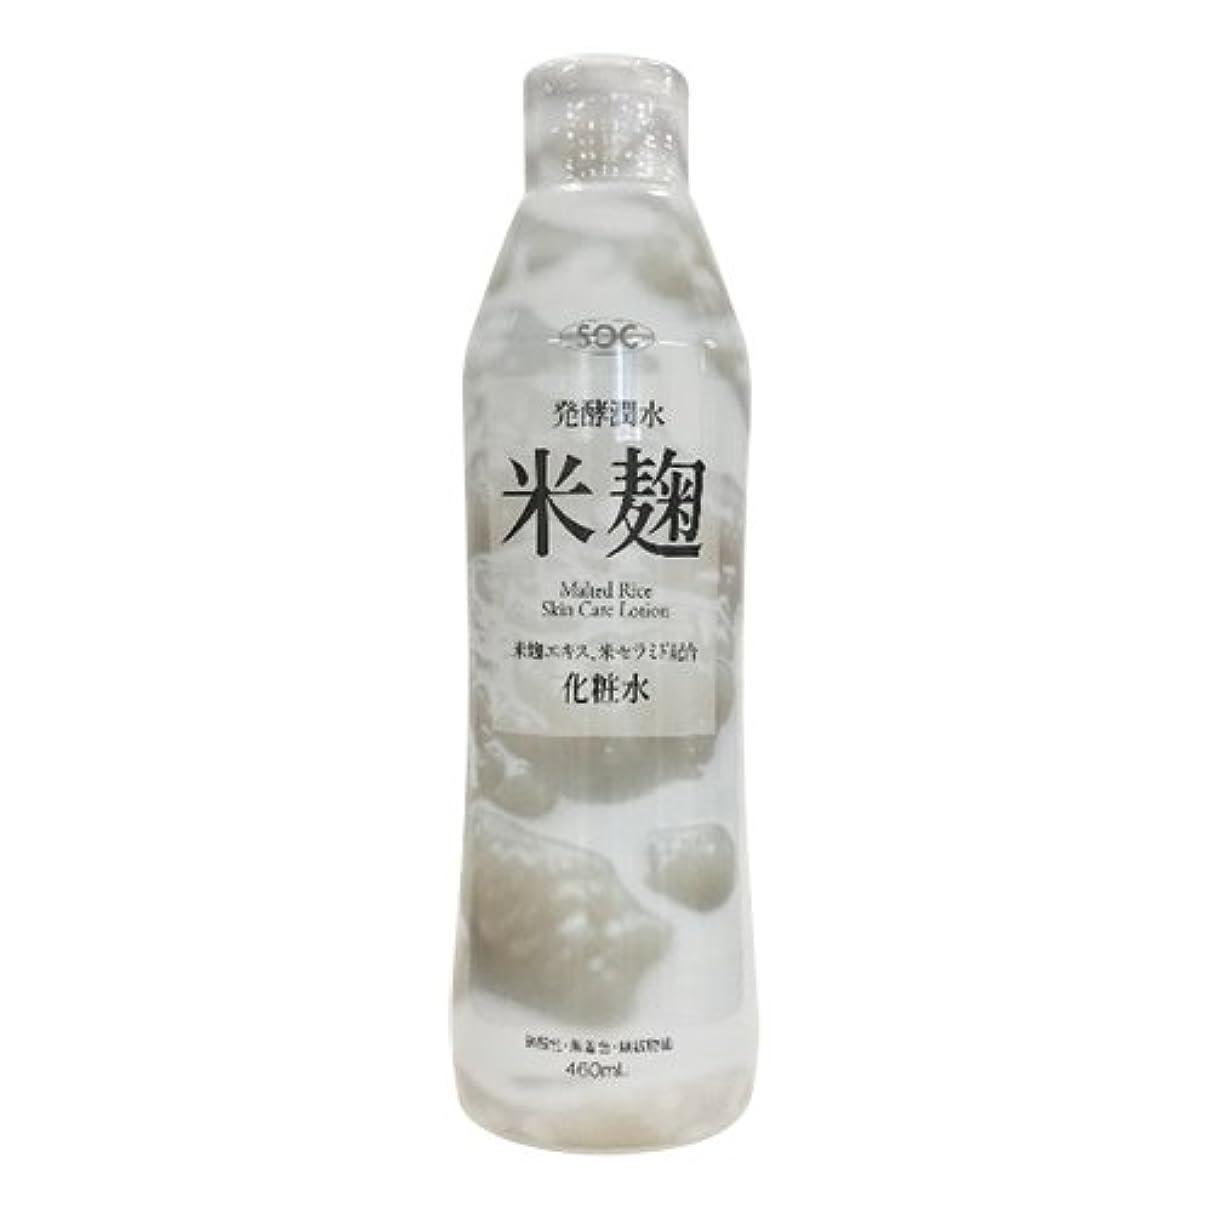 大脳卒業ごみSOC 米麹配合化粧水 (460mL)